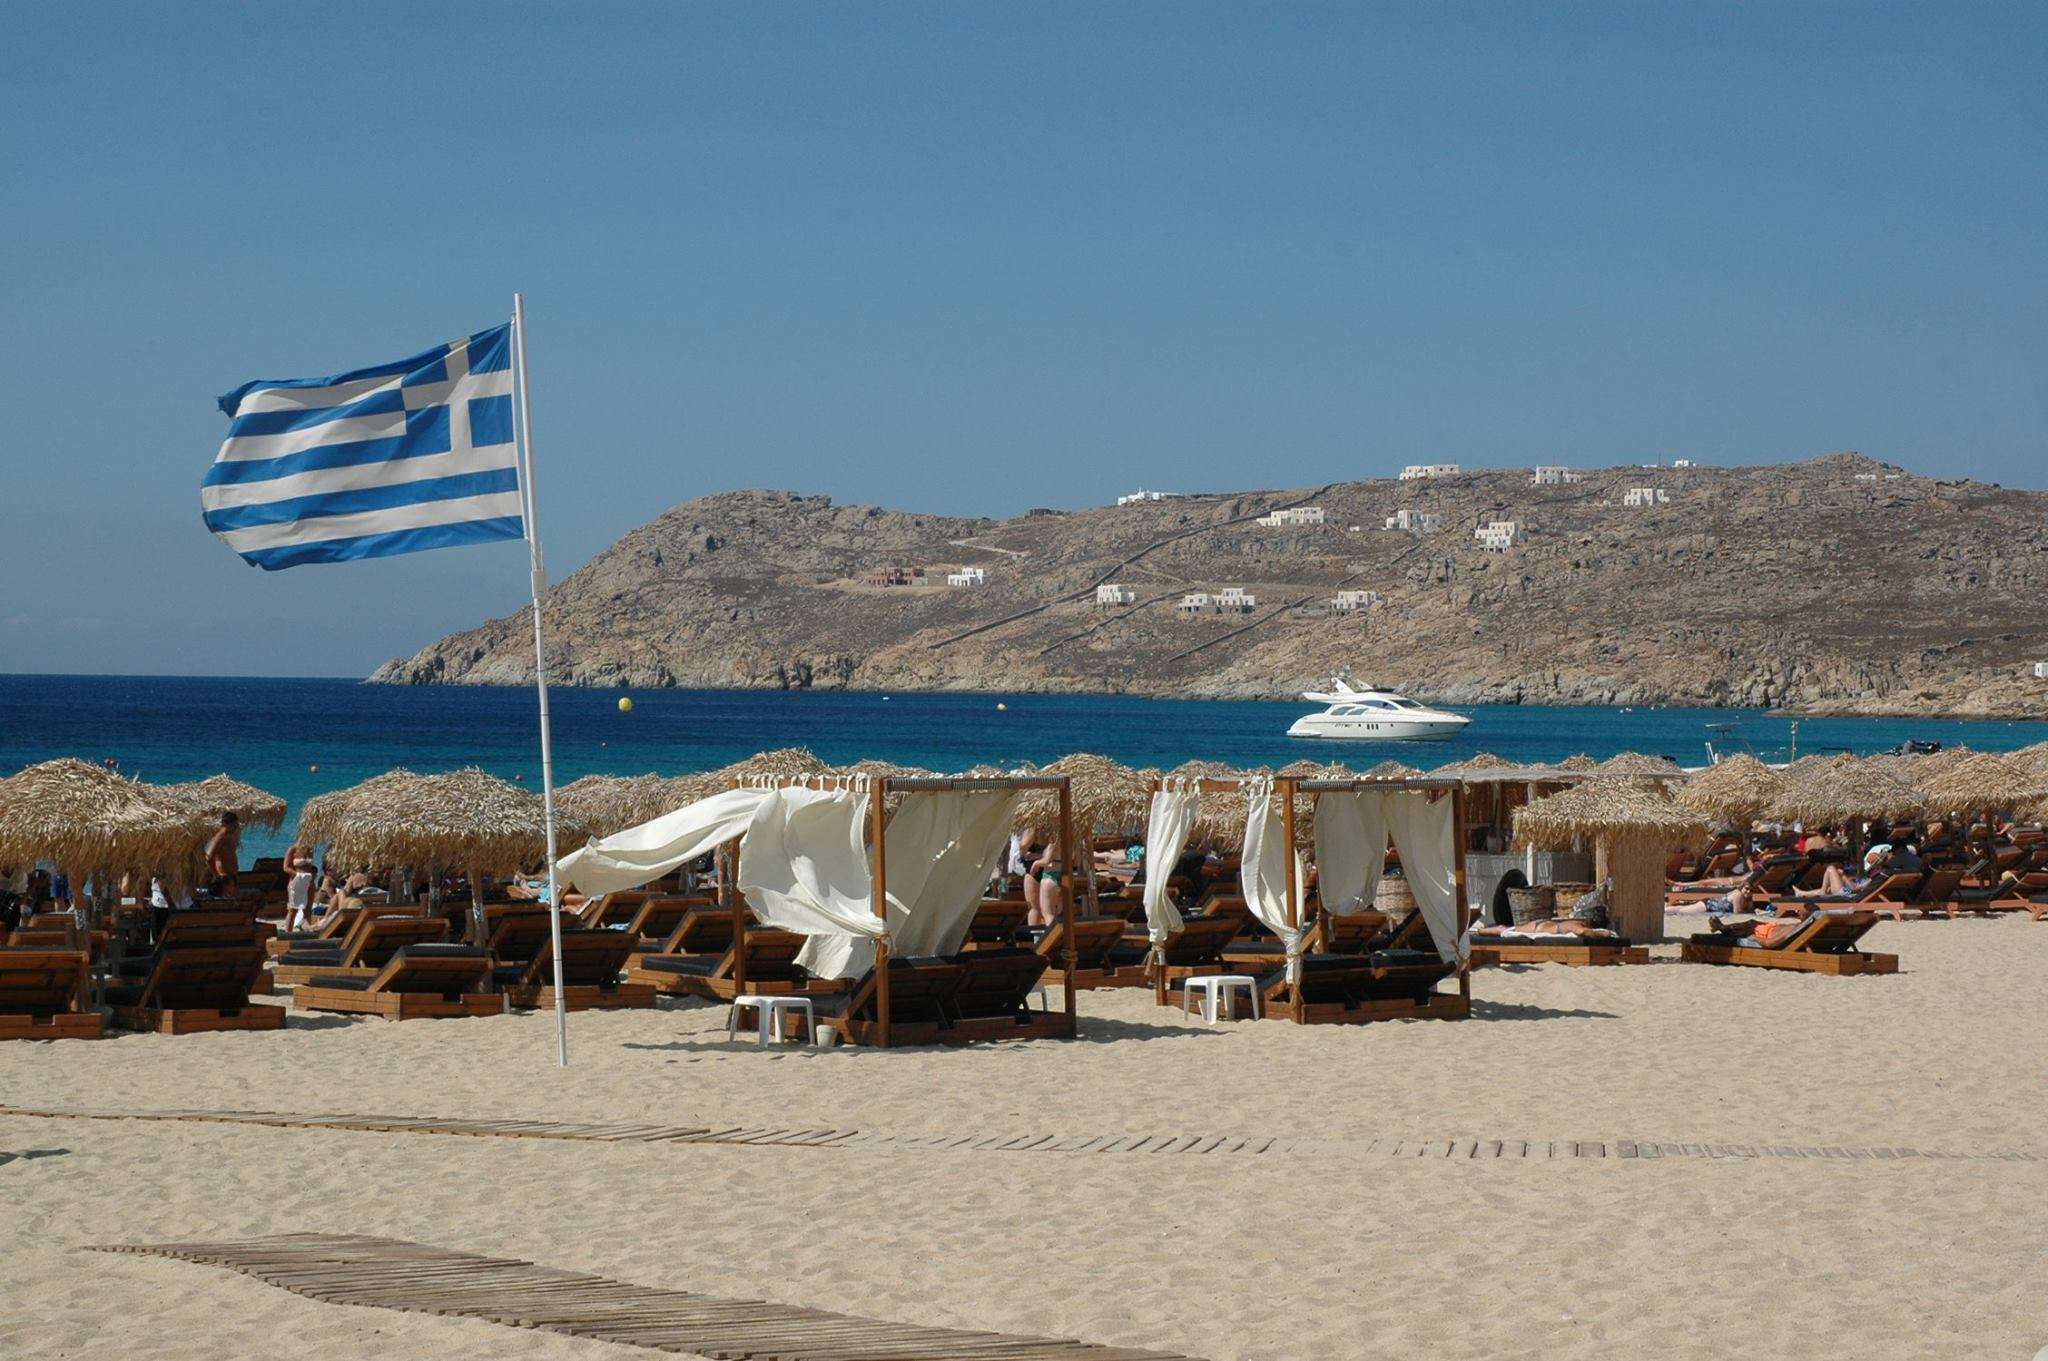 The view of Elia Beach from Elia Mediterranean Restaurant